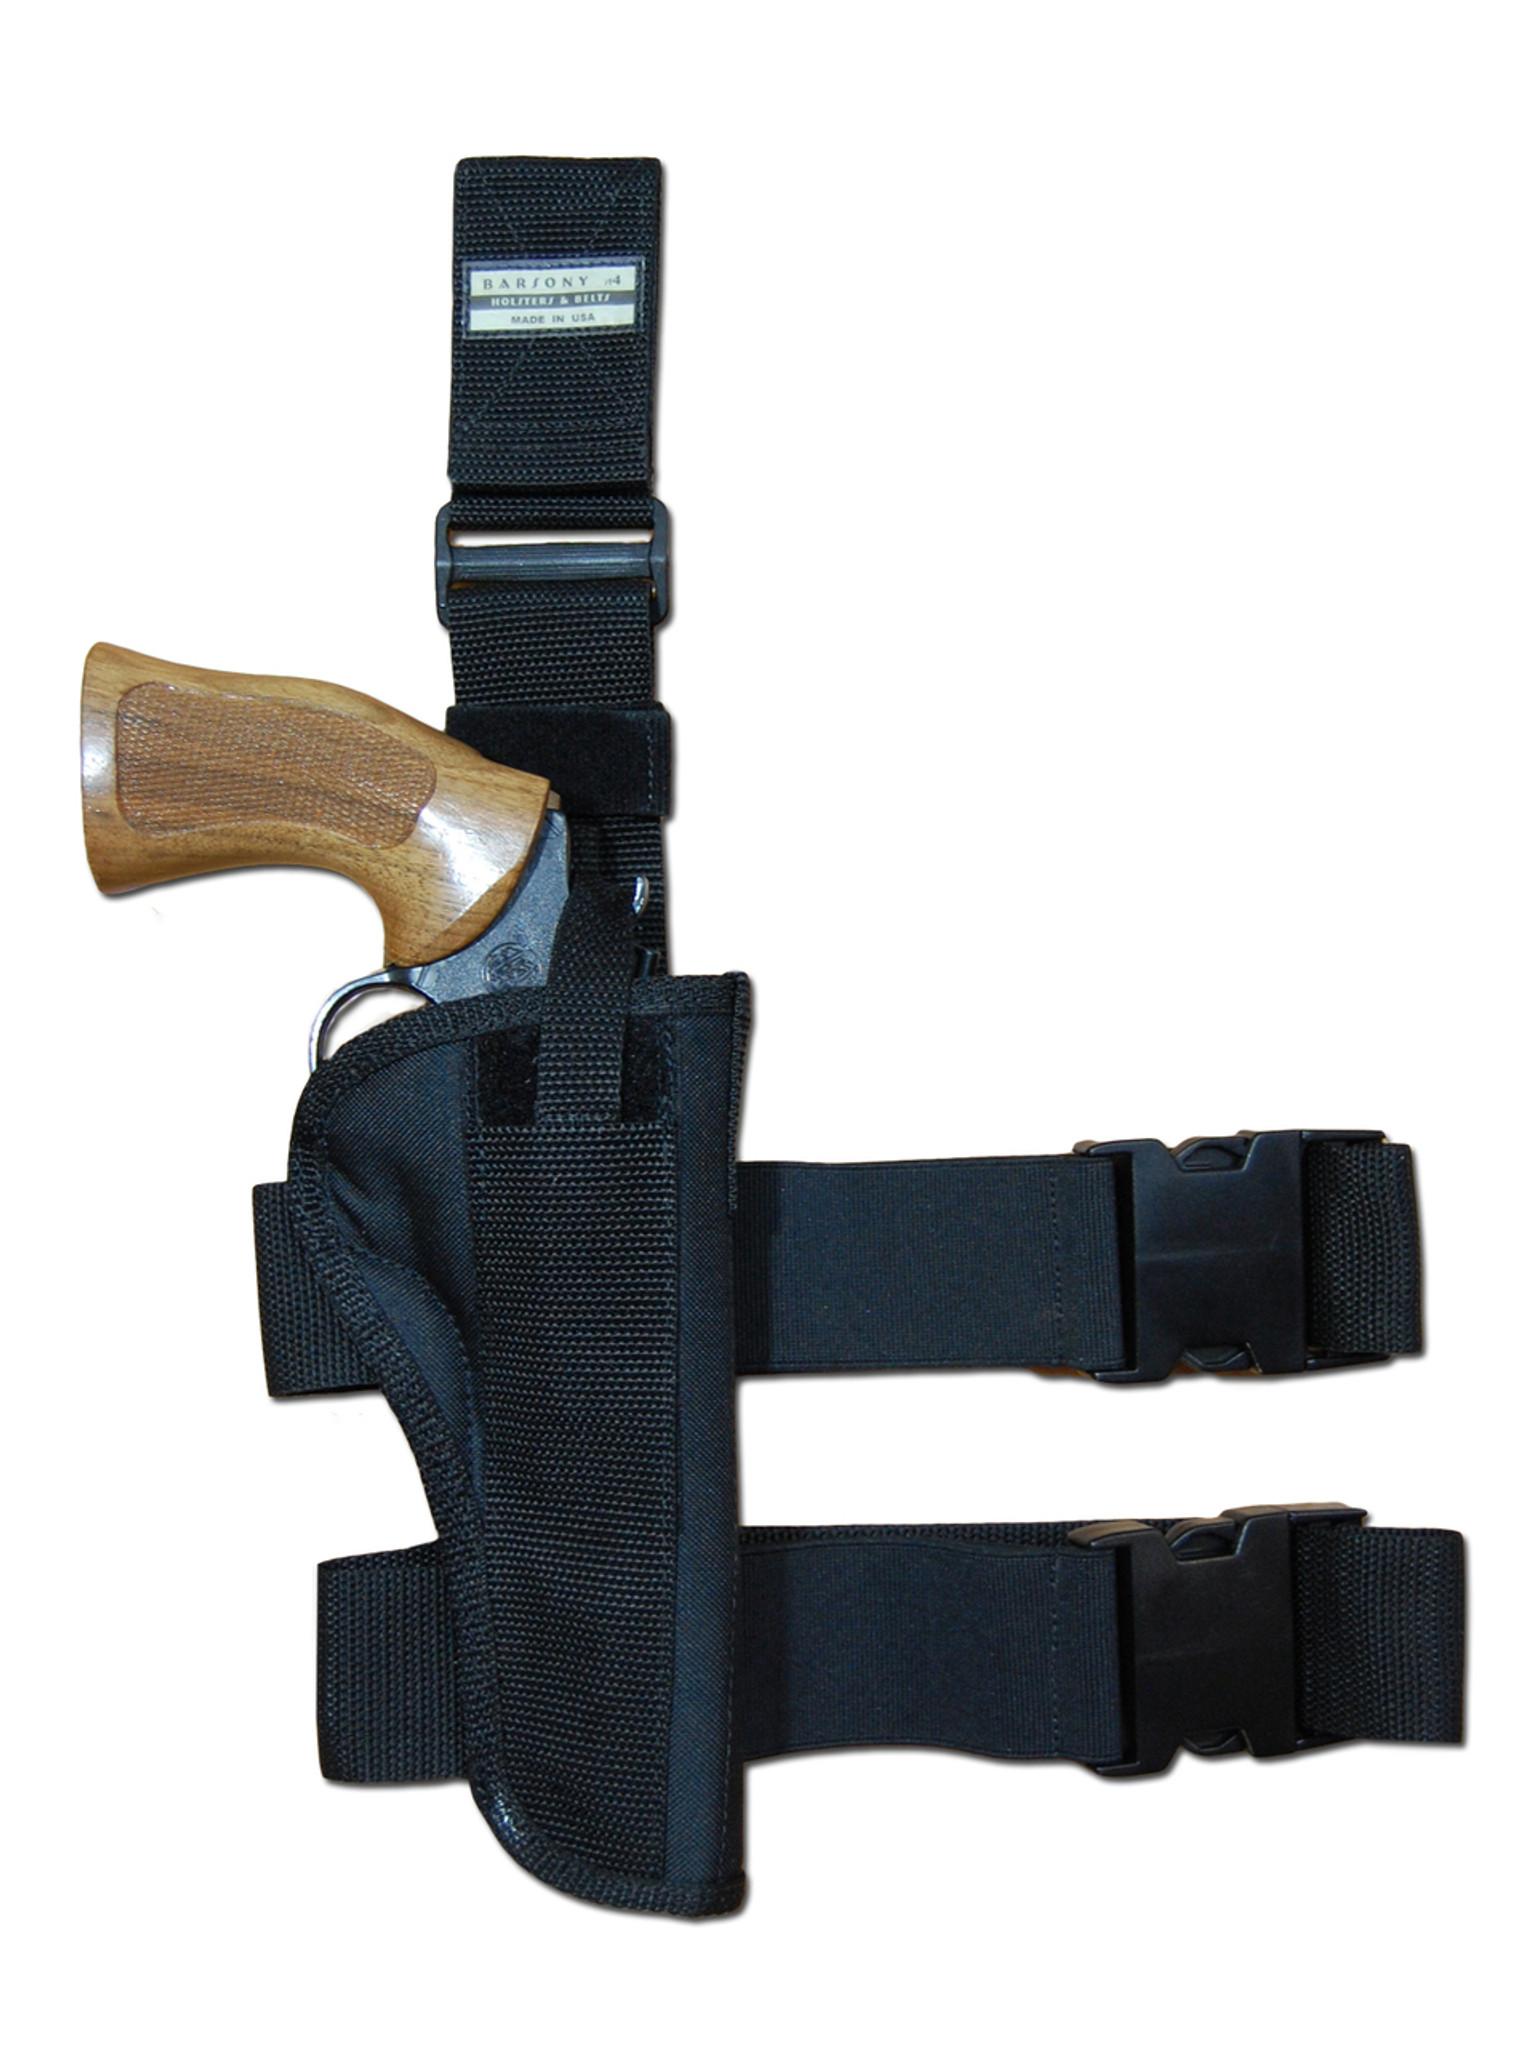 Tactical Leg Holster for 4